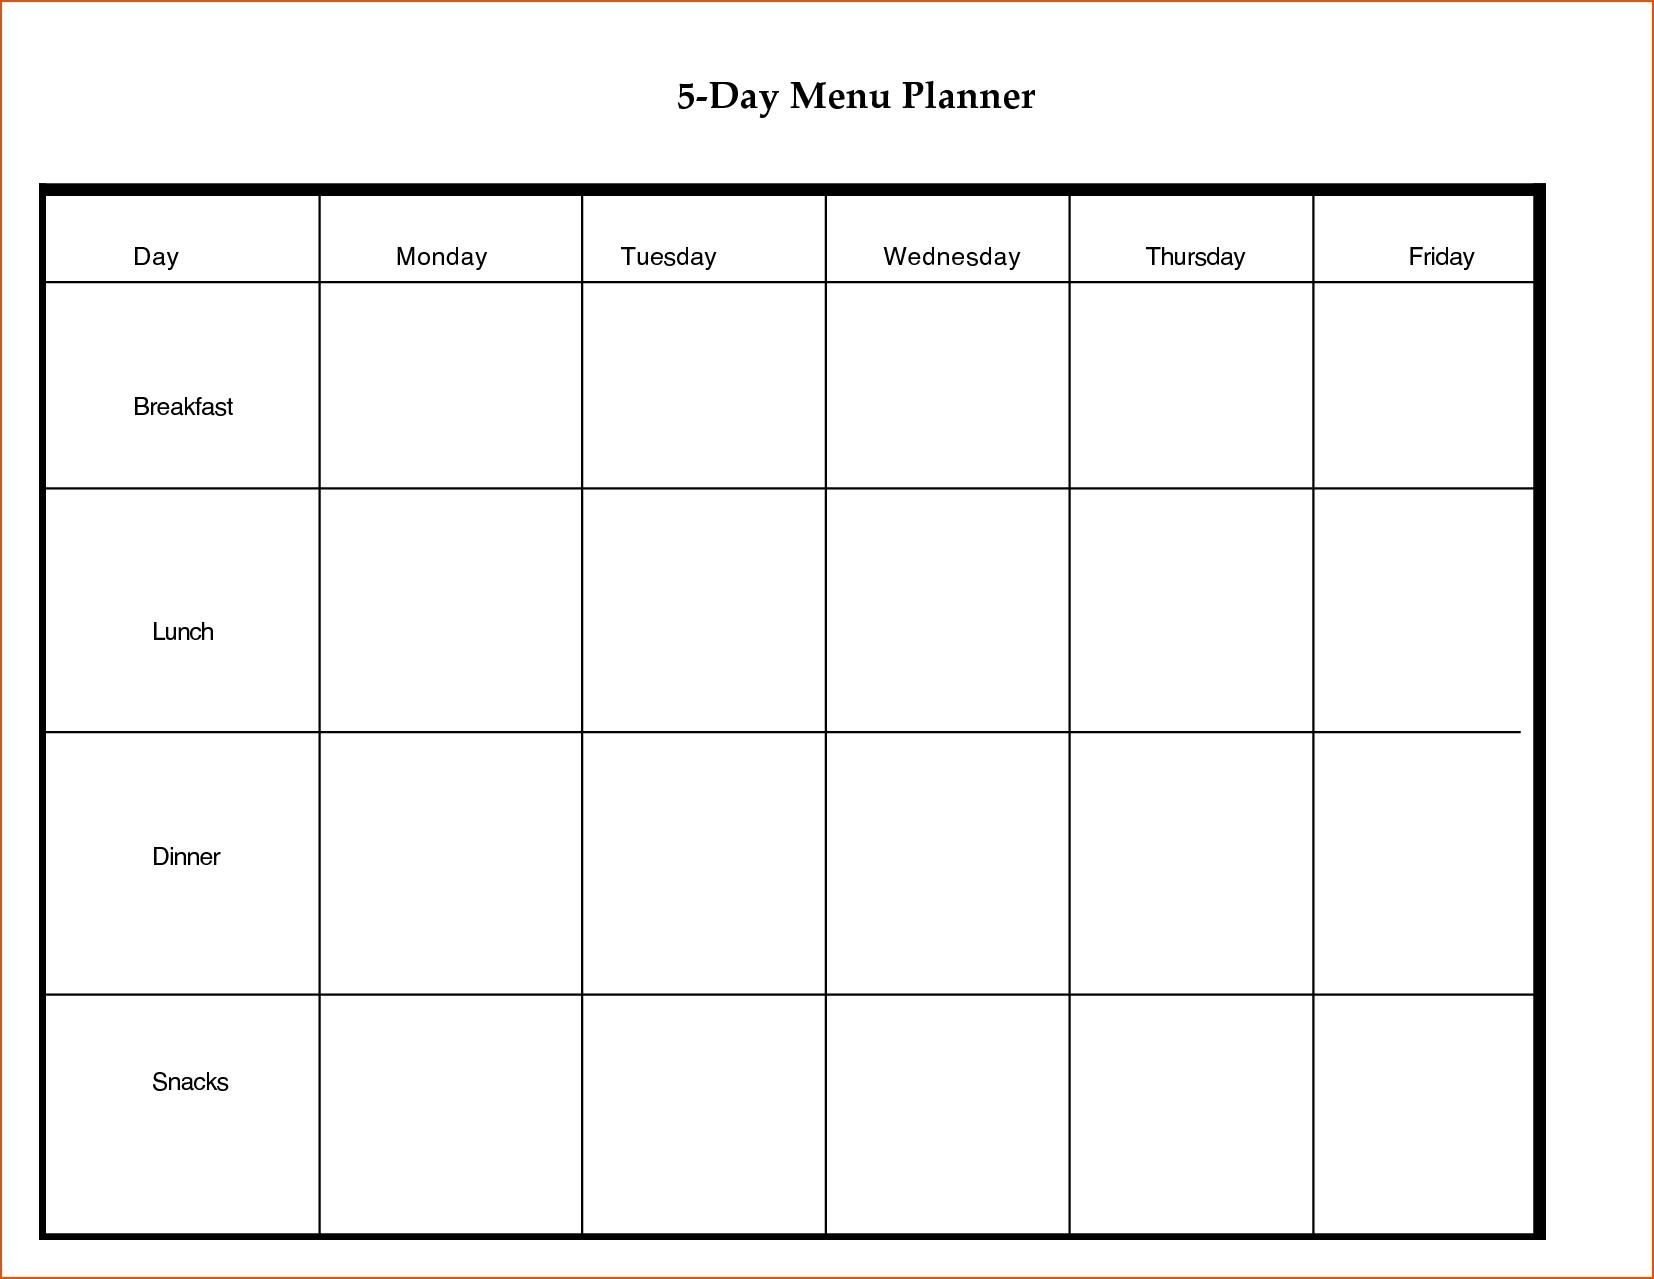 Monthly 5 Week Menu Rotation Template   Template Calendar Printable throughout Monthly 5 Week Menu Rotation Template